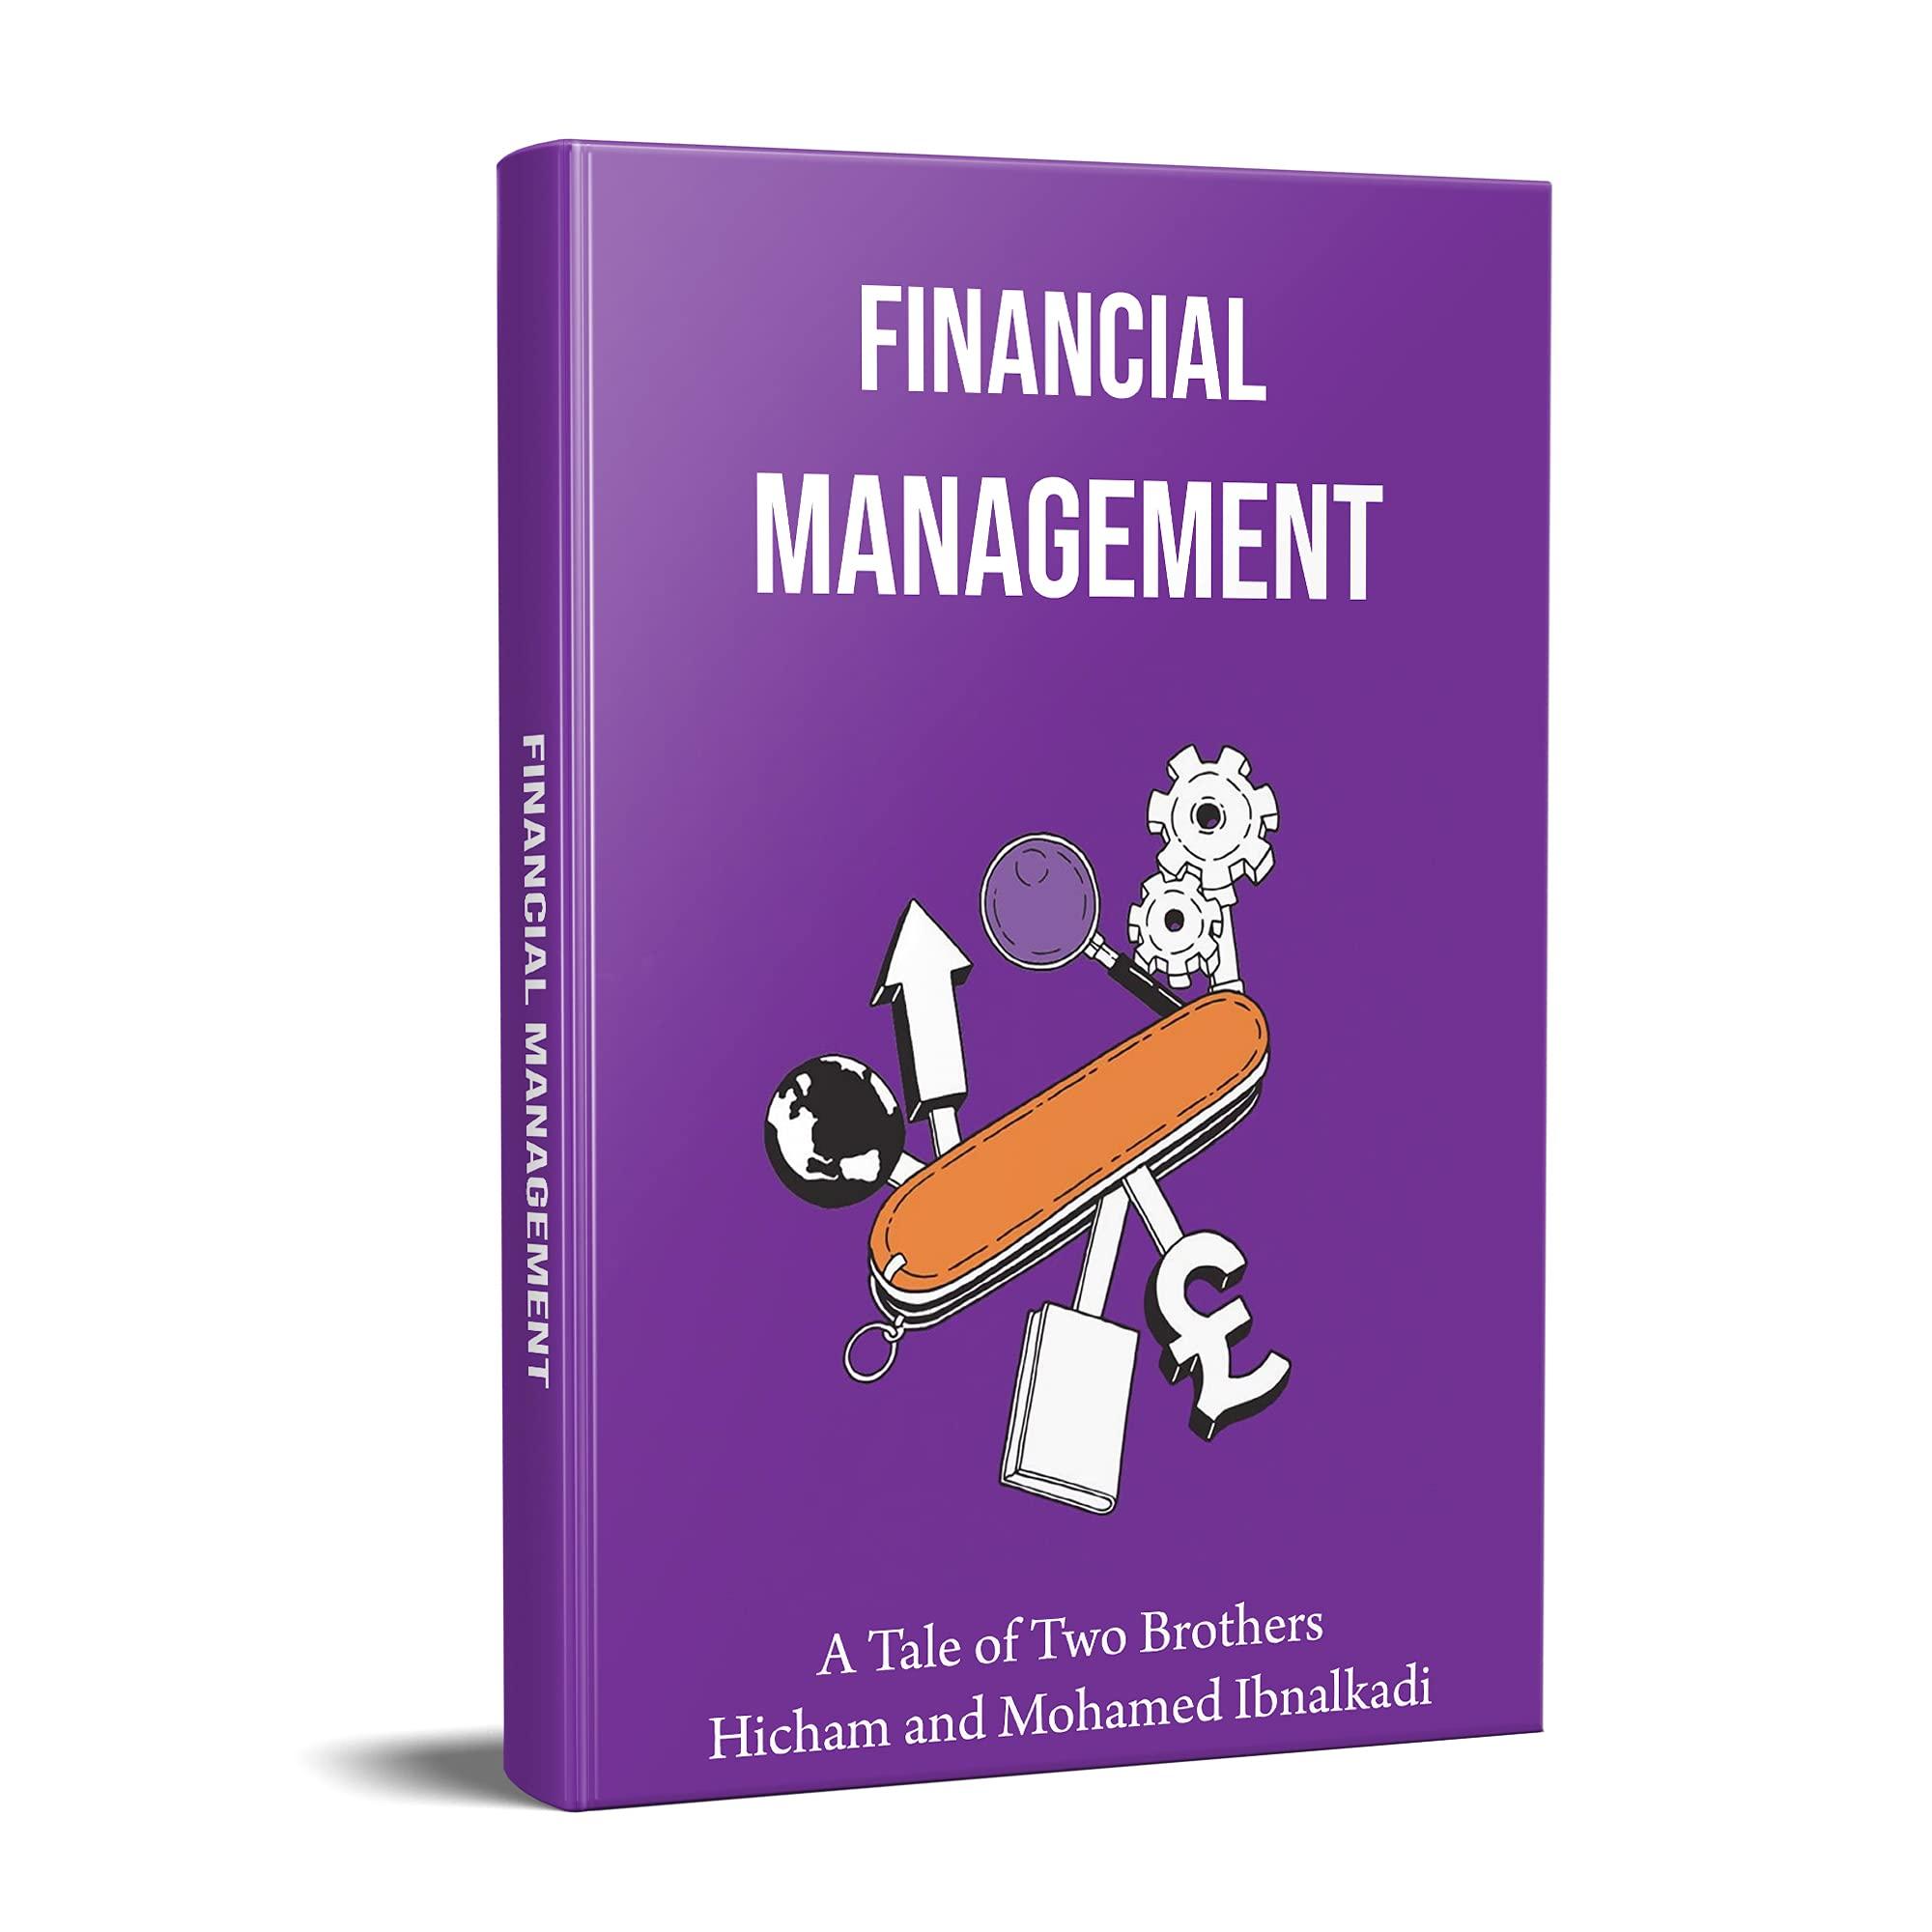 Financial Management (101 Non-Fiction Series Book 19)